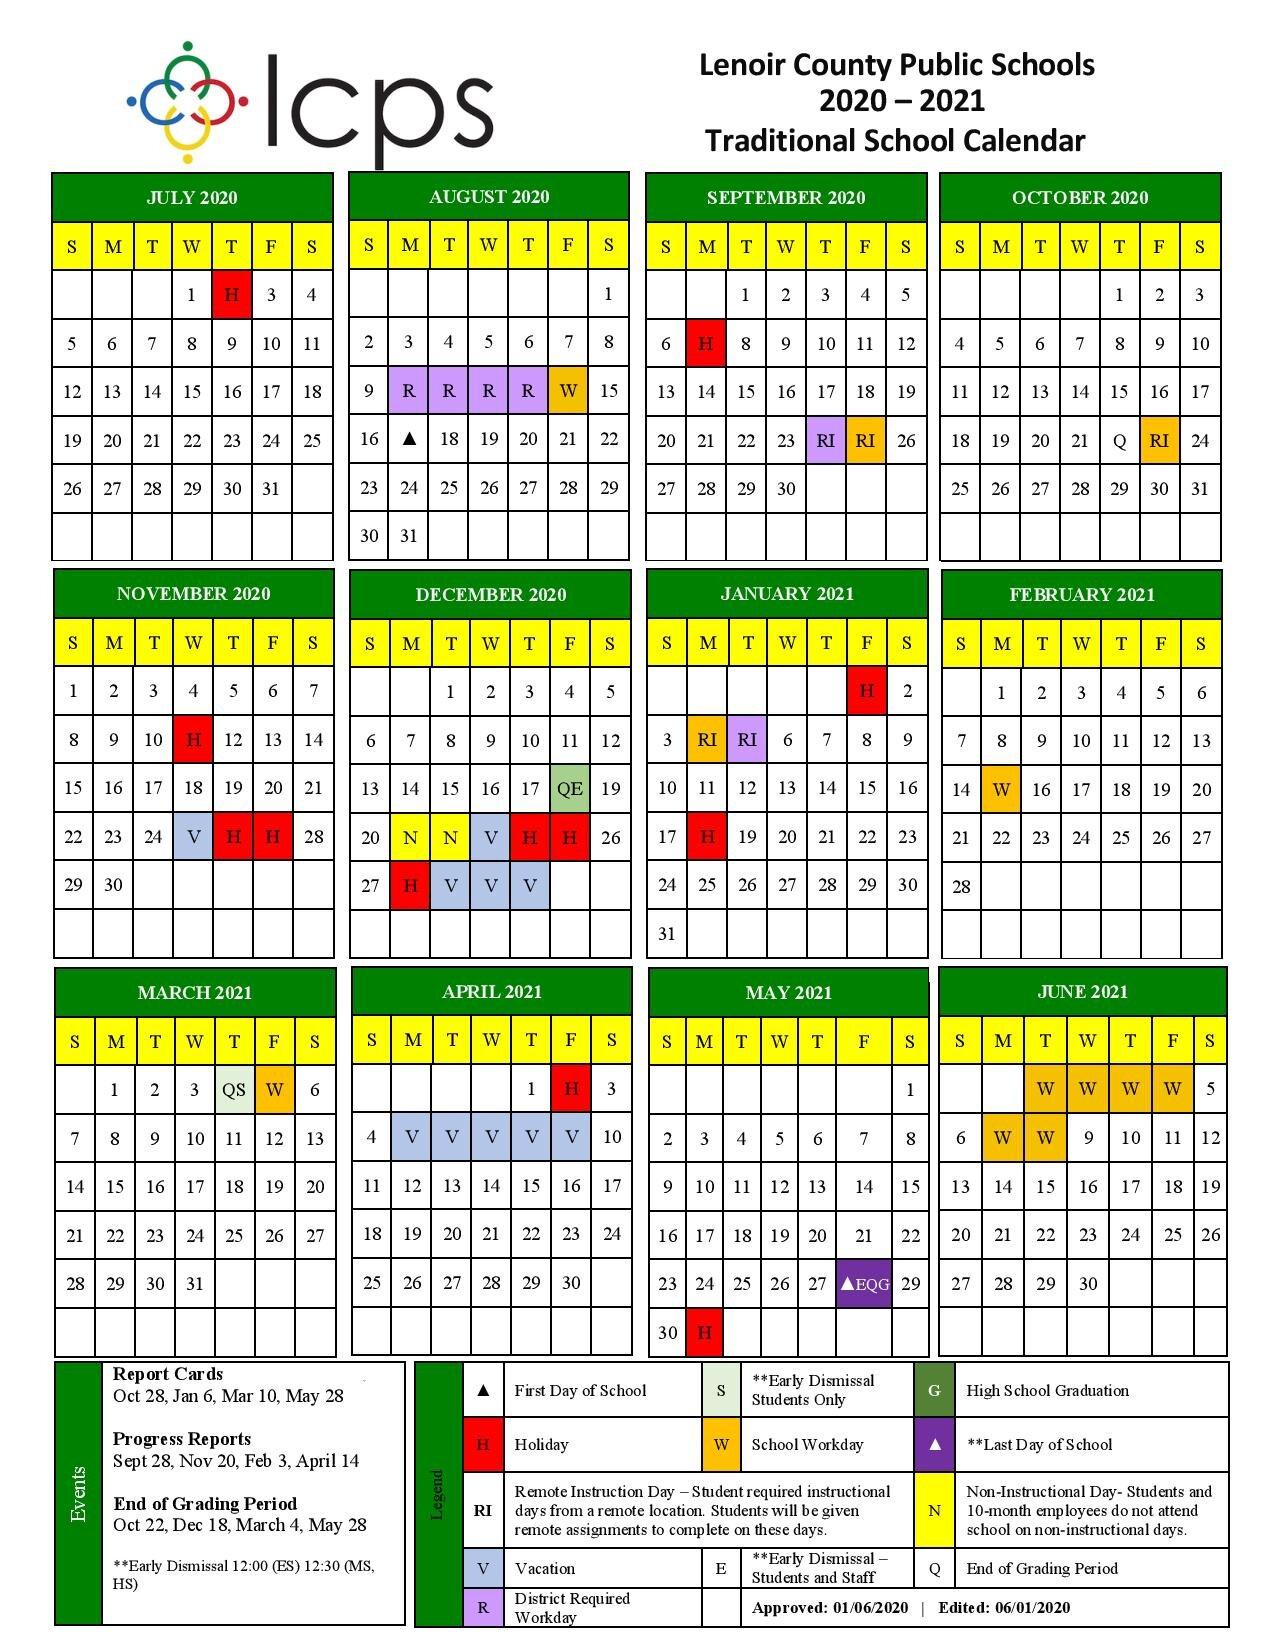 Howard County Public Schools Calendar 2021 Lenoir County Public Schools releases the revised 2020 2021 school